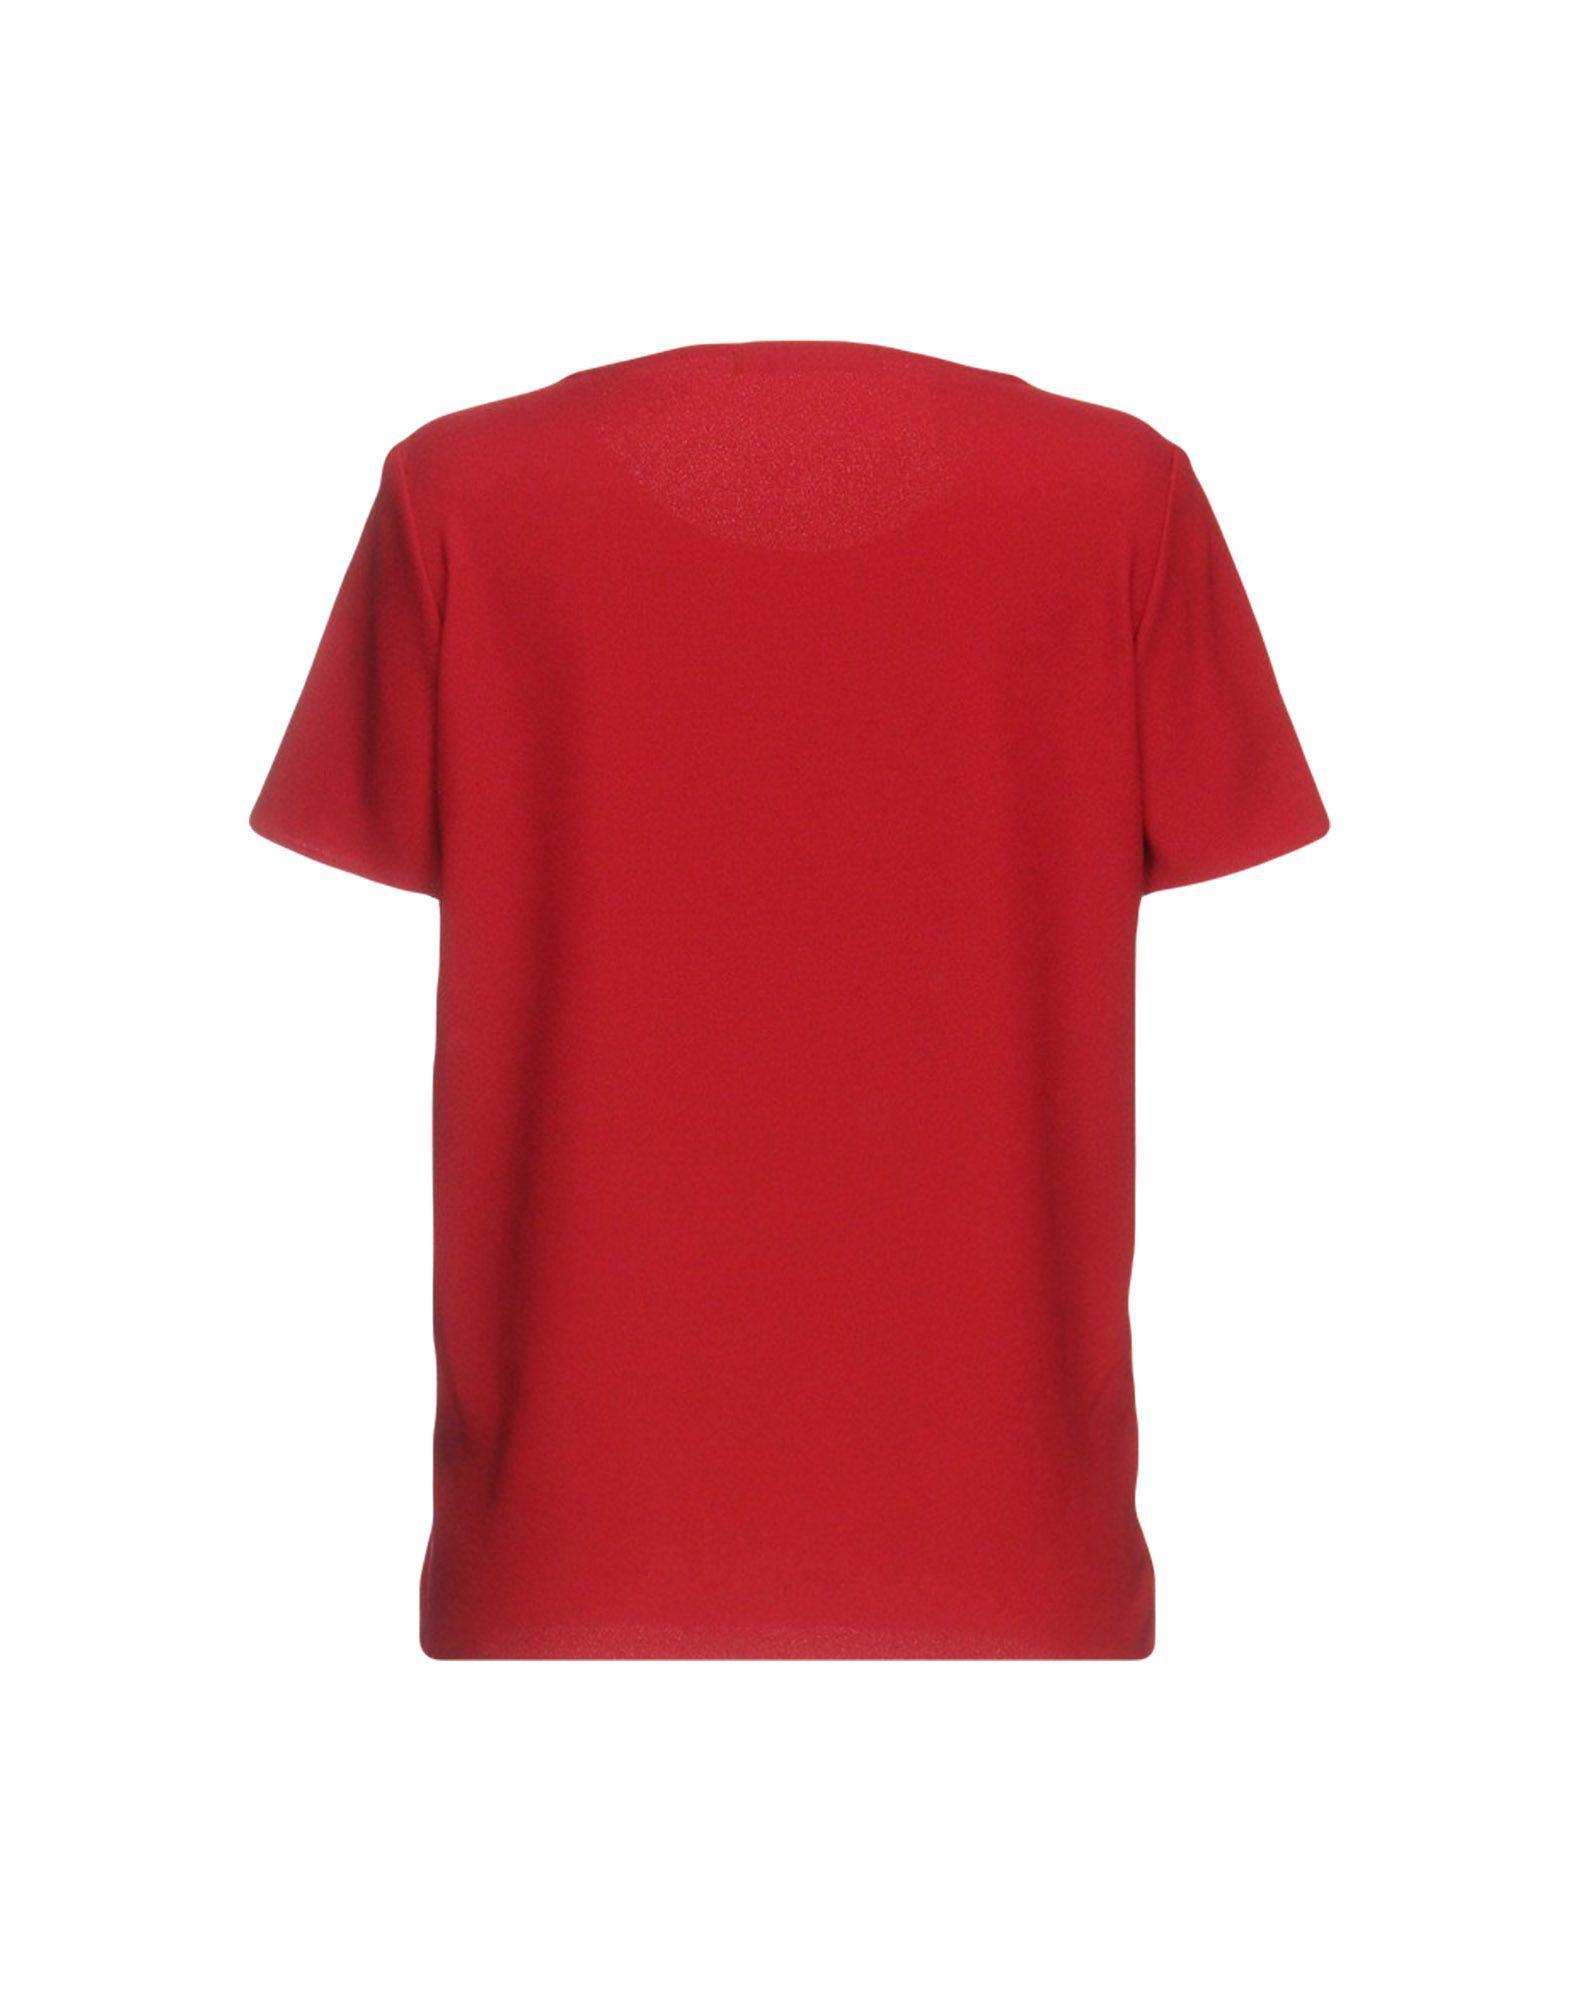 SHIRTS Rary Brick red Woman Polyester